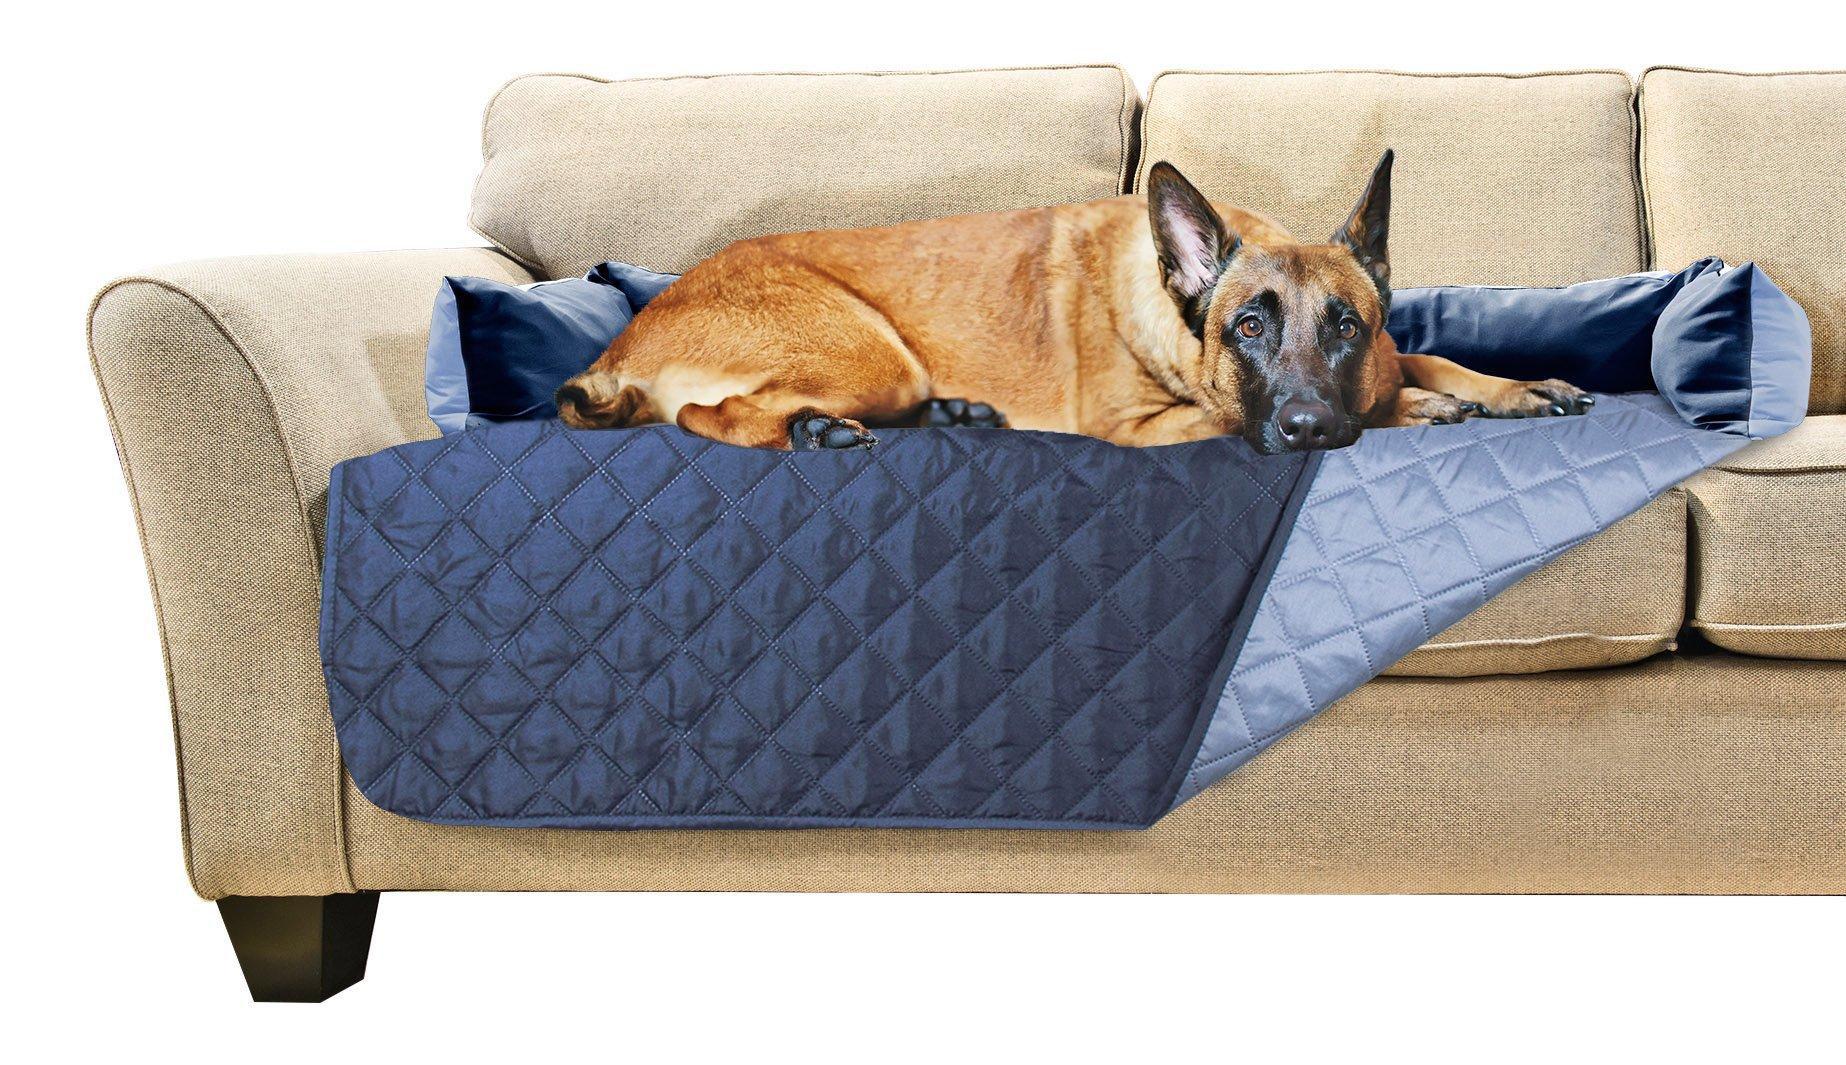 Wondrous Details About Furhaven Pet Furniture Cover Sofa Buddy Reversible Furniture Cover Protector Machost Co Dining Chair Design Ideas Machostcouk